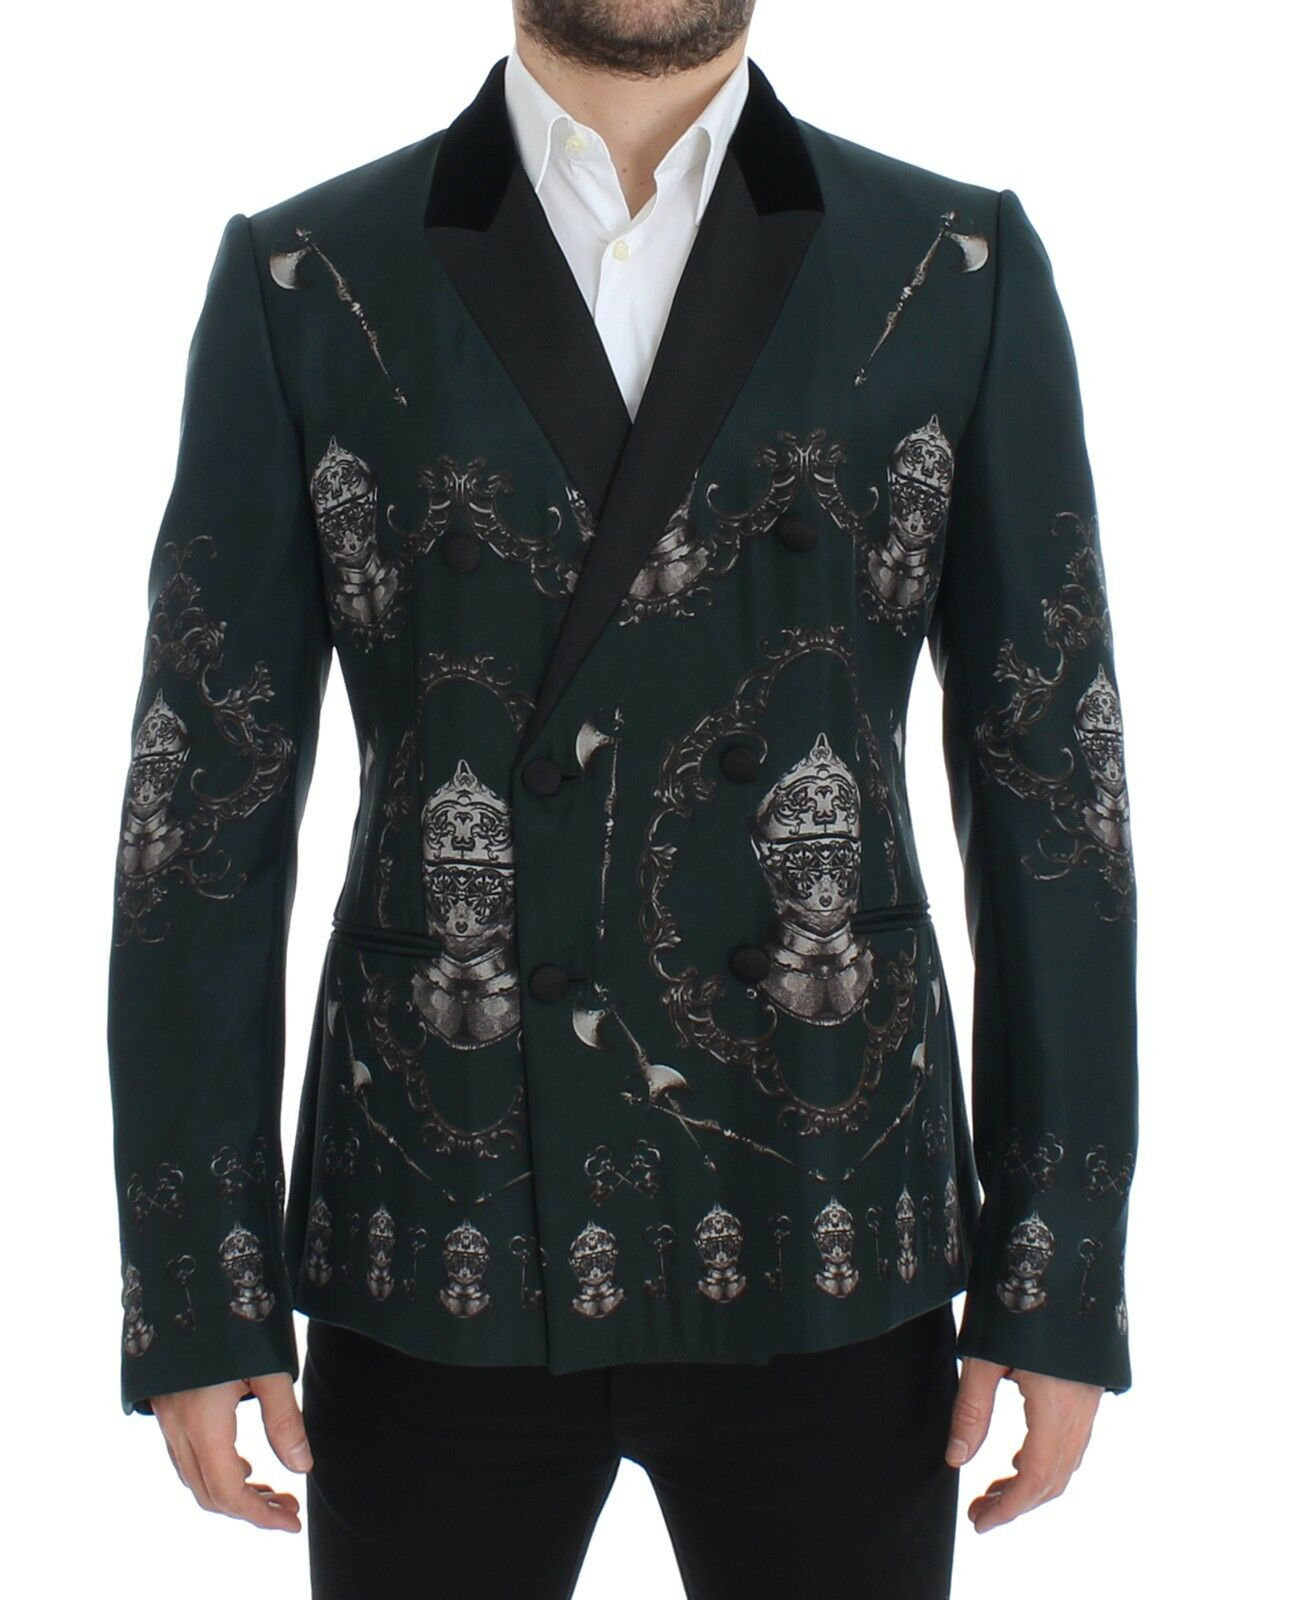 Nuovo Dolce & Gabbana Giacca Verde Seta Cavaliere Slim Giacca IT48/US38/M